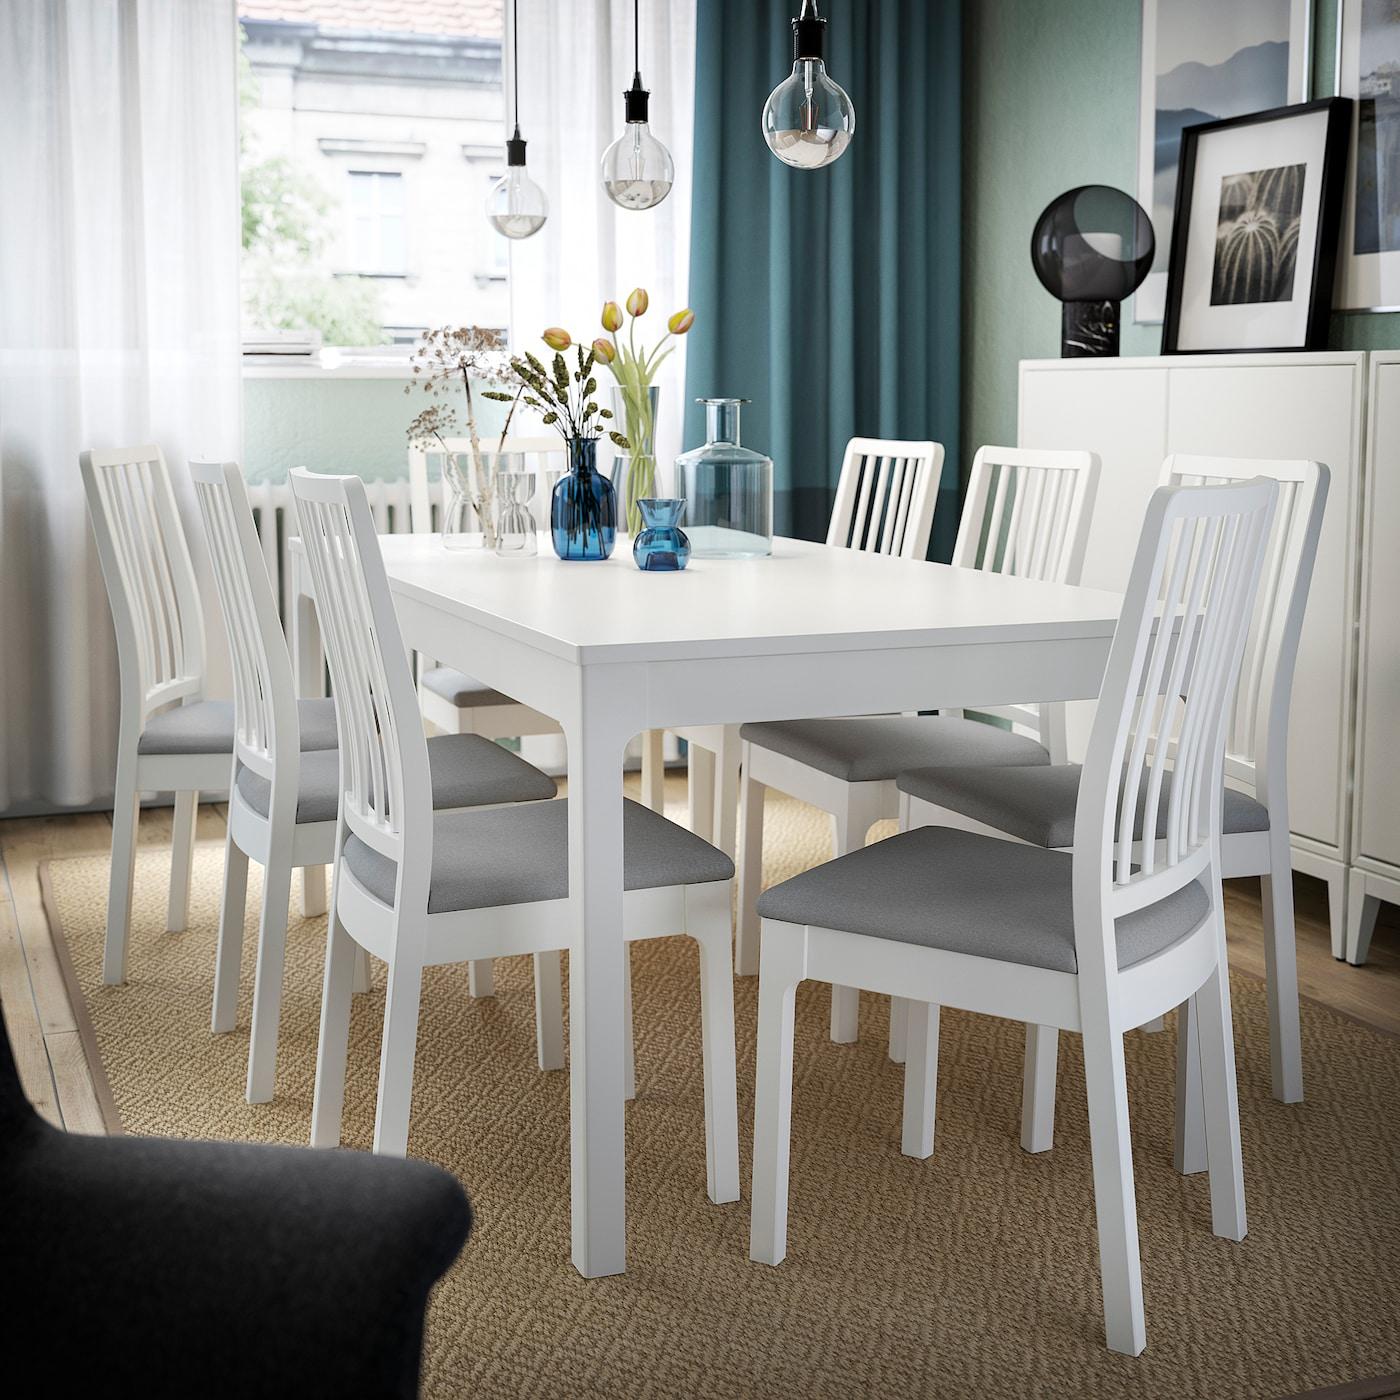 Ekedalen Ekedalen Table And 6 Chairs White Orrsta Light Gray Ikea